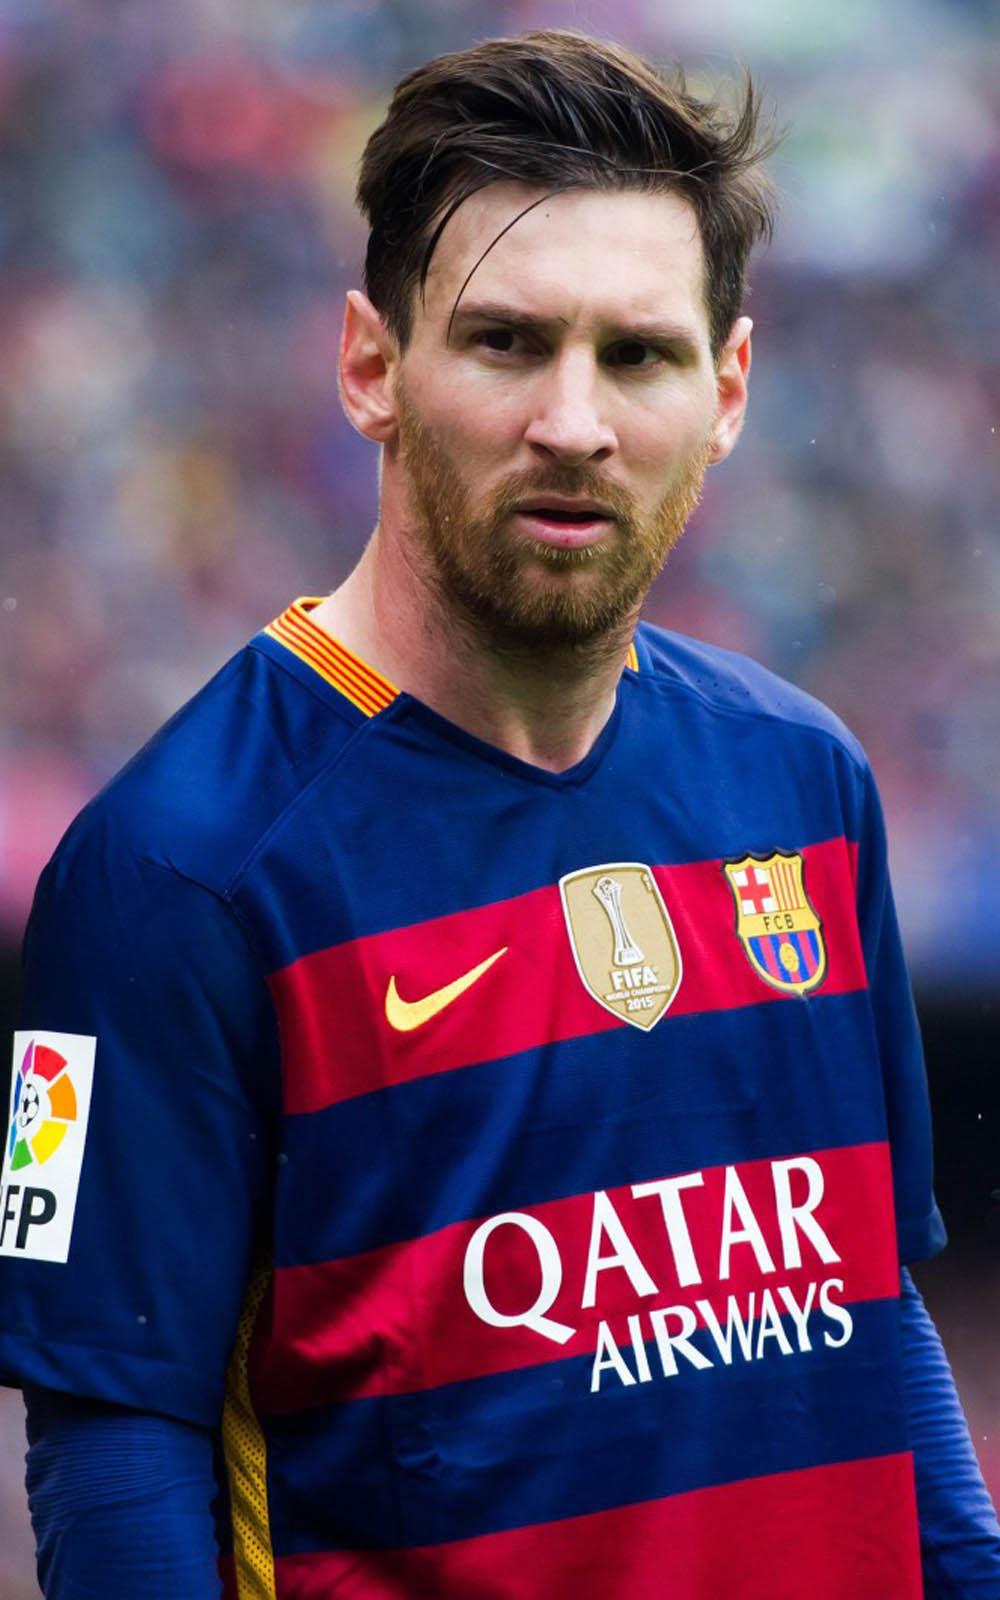 Lionel Messi FC Barcelona Moment Free 4K Ultra HD Mobile ...